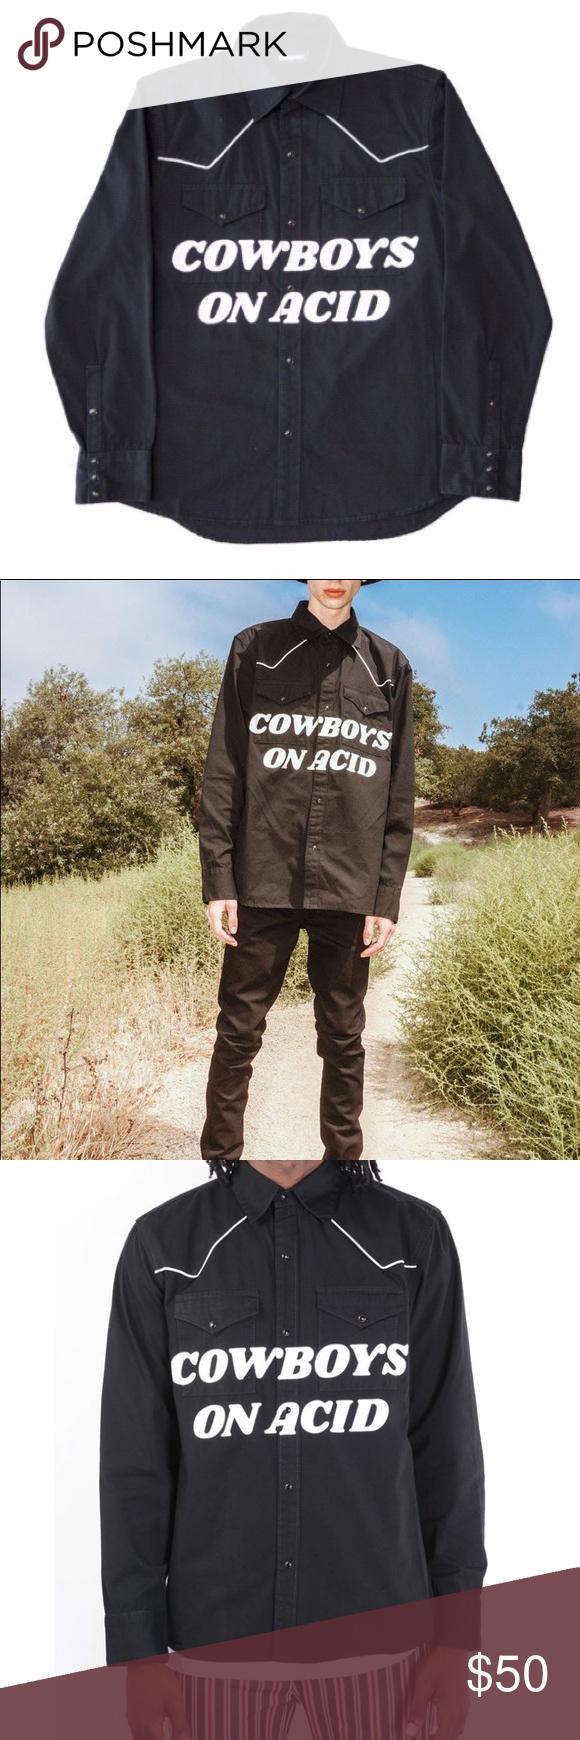 0ed0675f PLEASURES Cowboys on Acid Shirt - Men's Medium PLEASURES Cowboys on Acid  Shirt Men's Size: